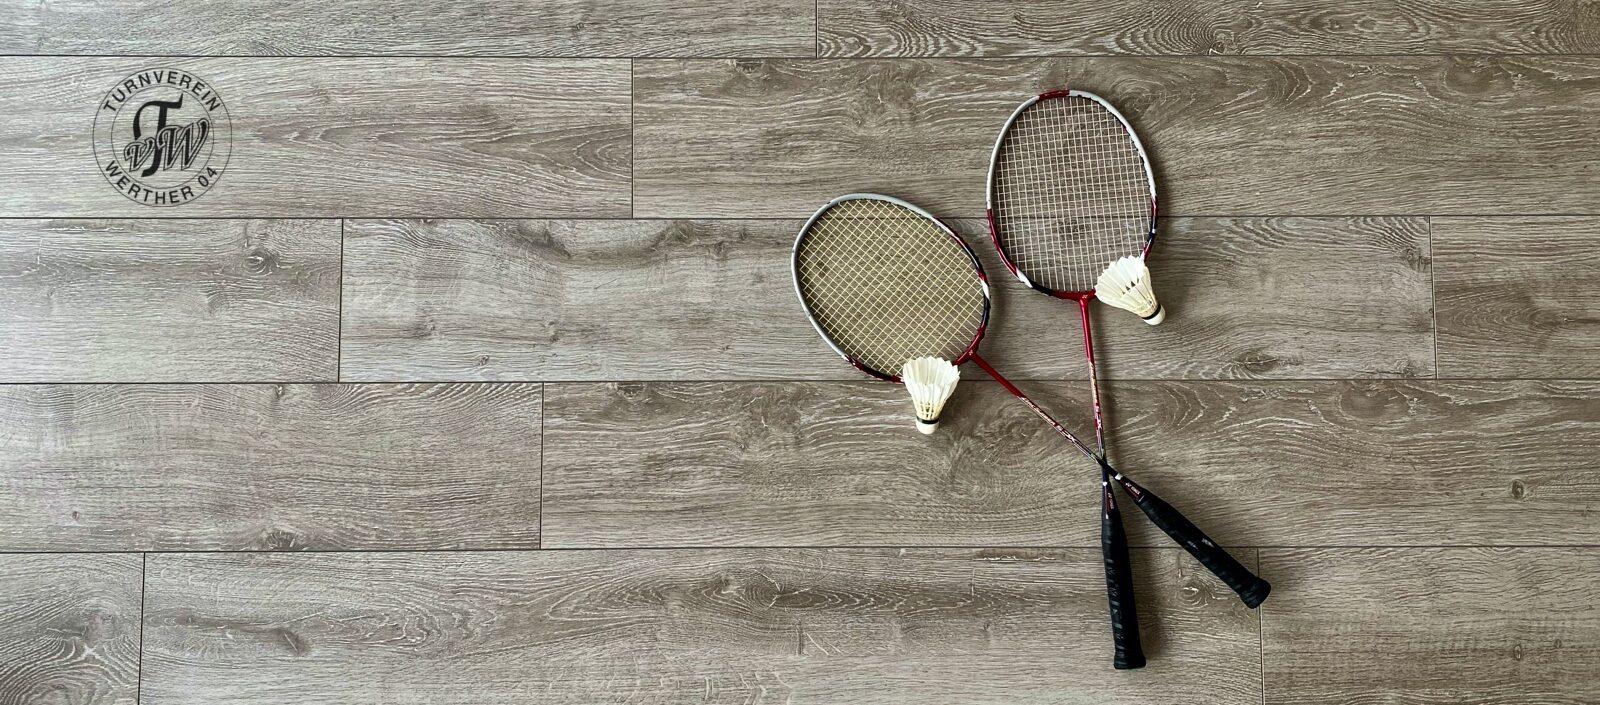 TV Werther 04 Badminton